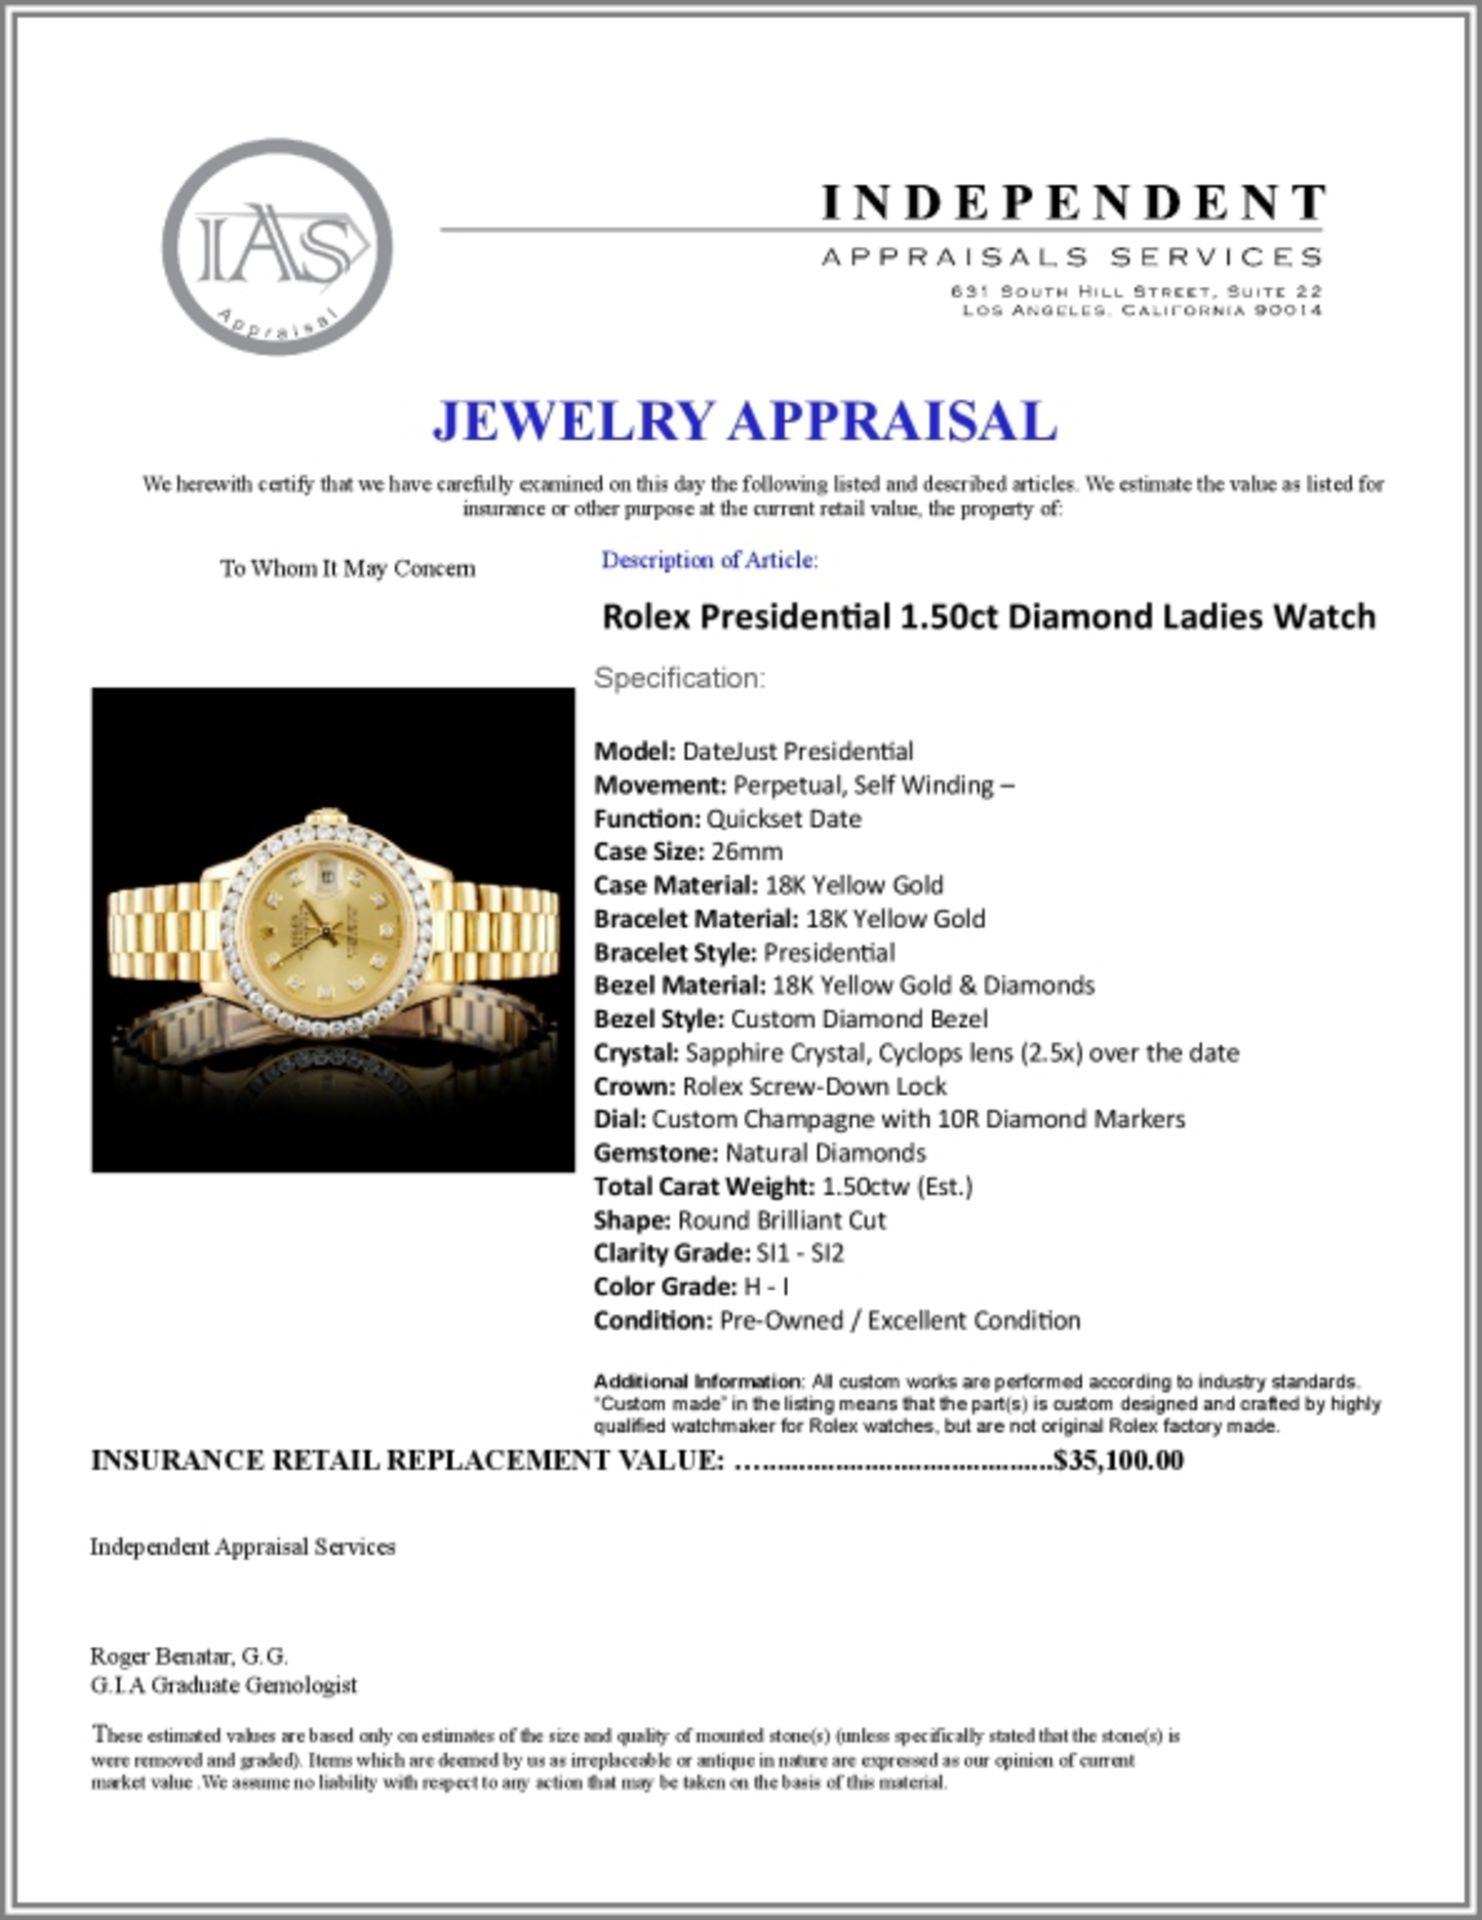 Rolex Presidential Diamond Ladies Watch - Image 5 of 5